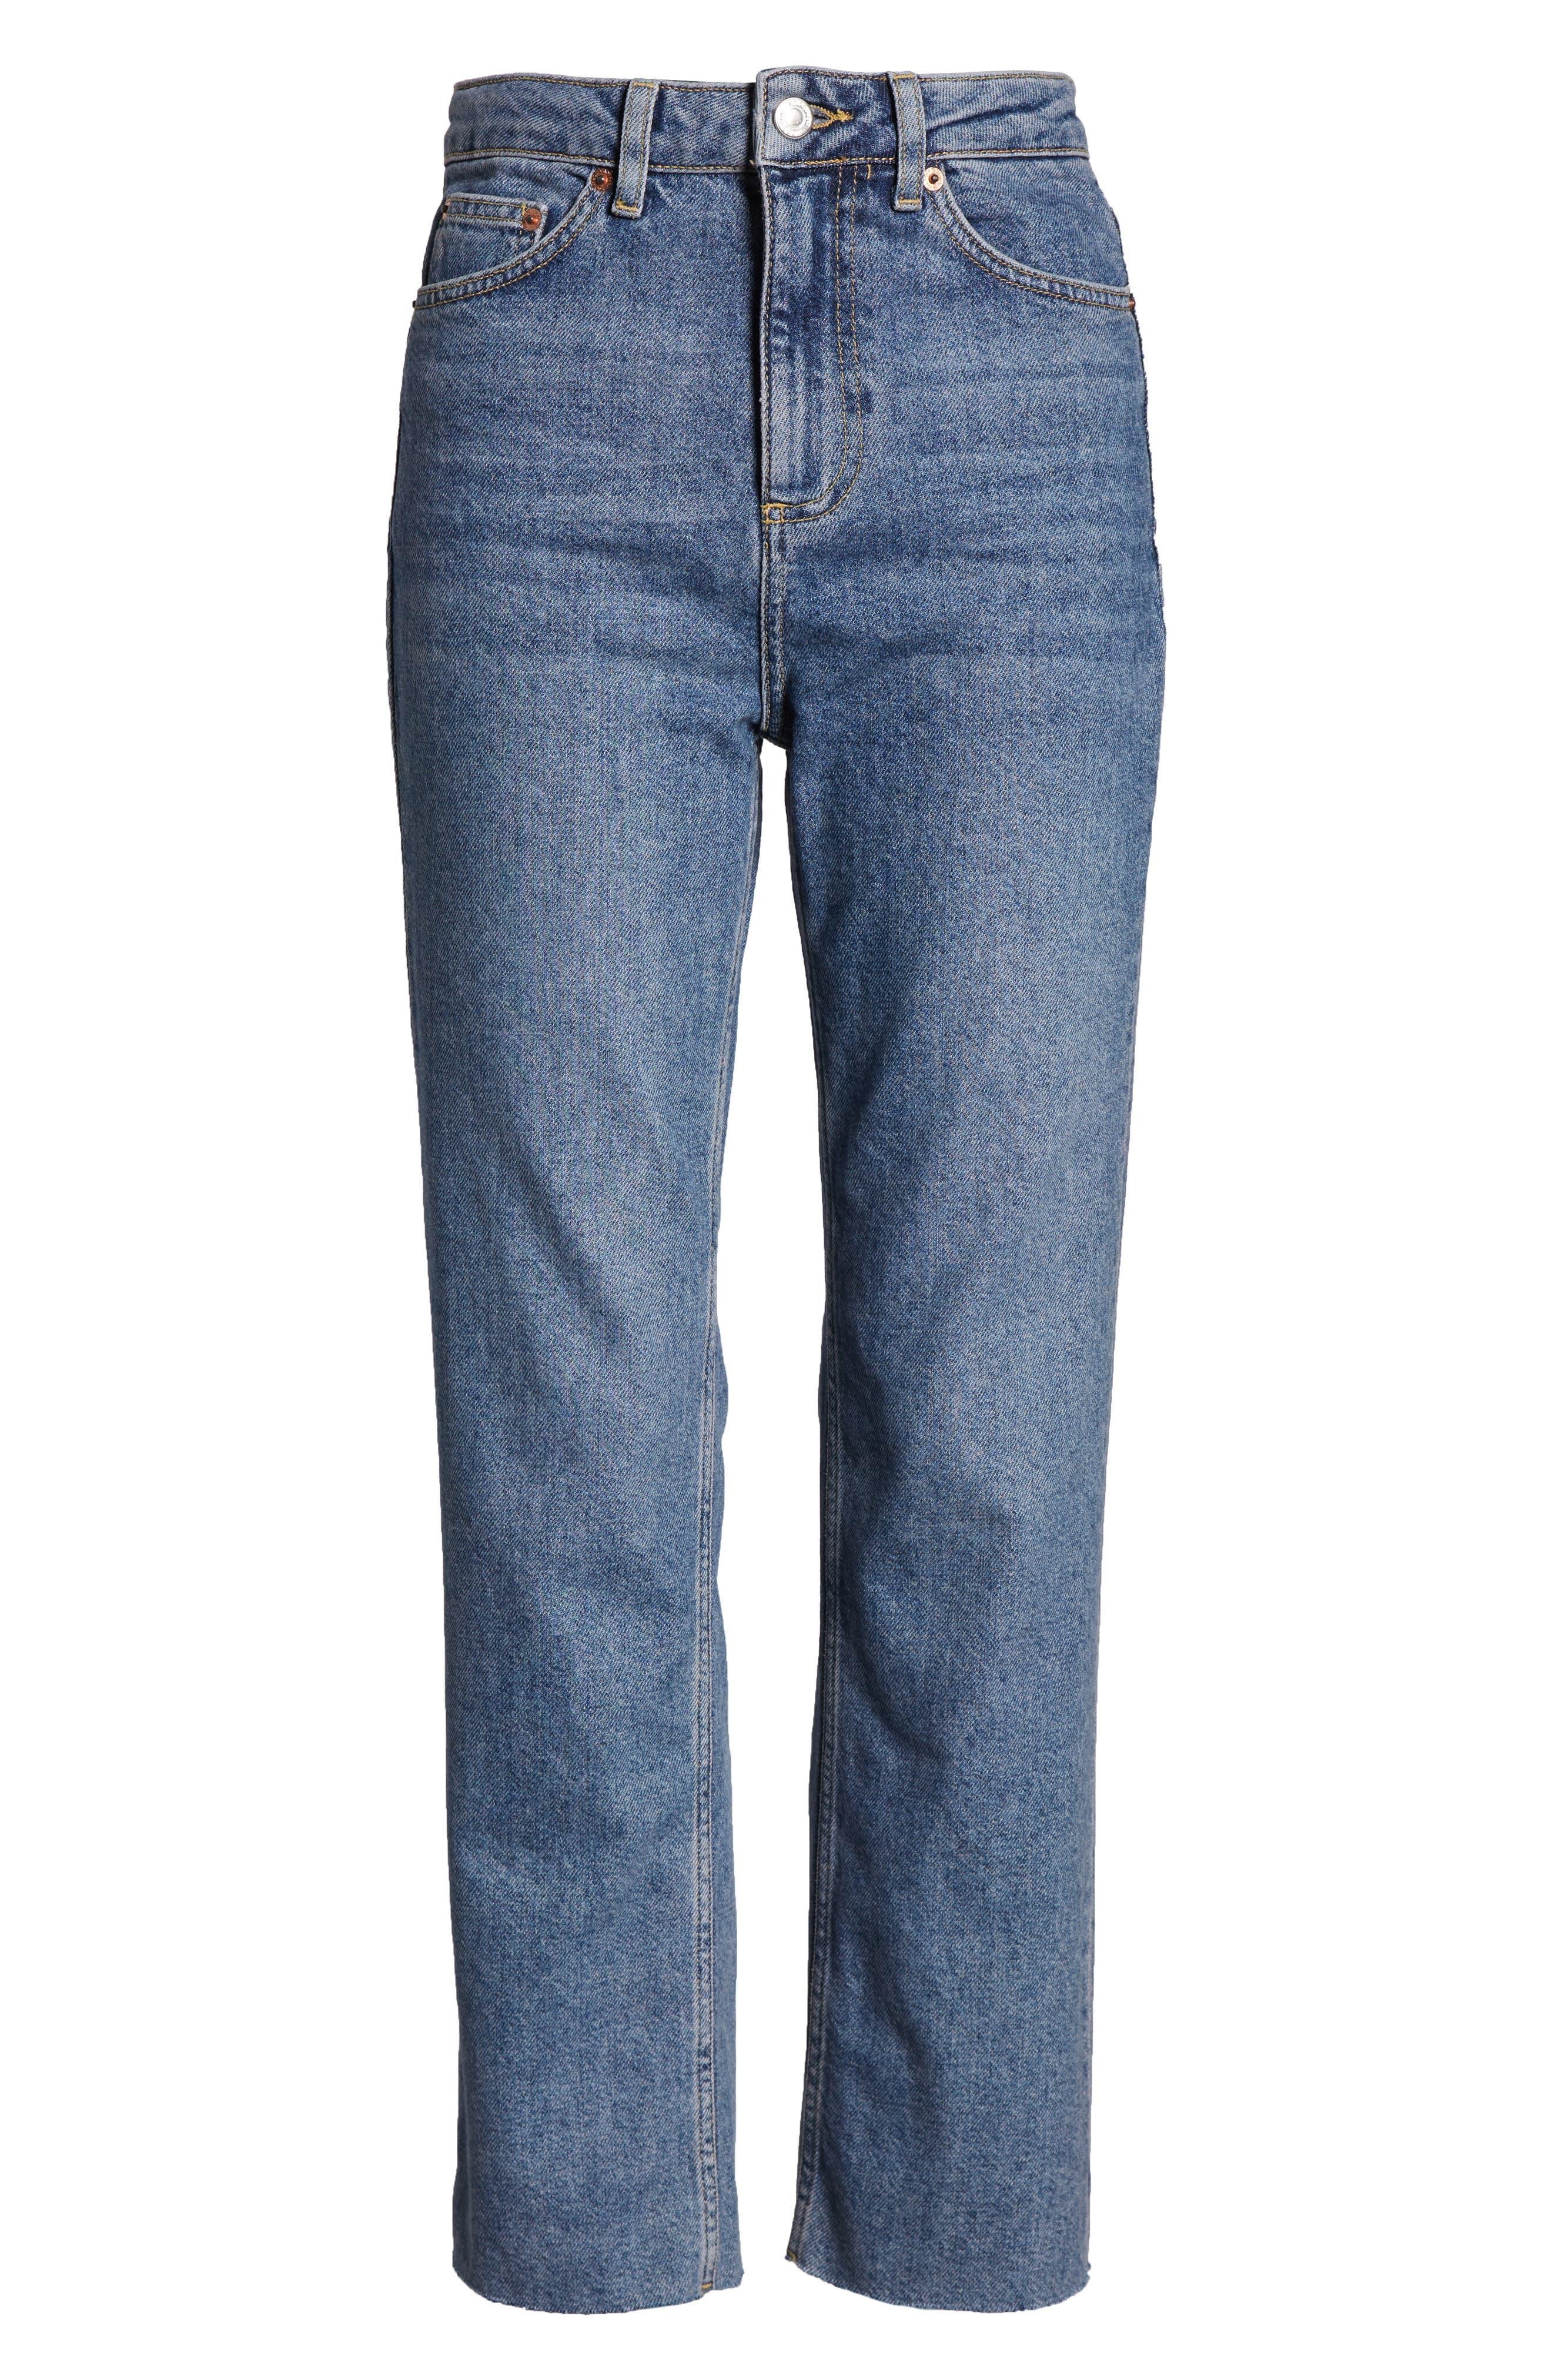 Raw Hem Straight Leg Jeans,                             Alternate thumbnail 7, color,                             MID BLUE